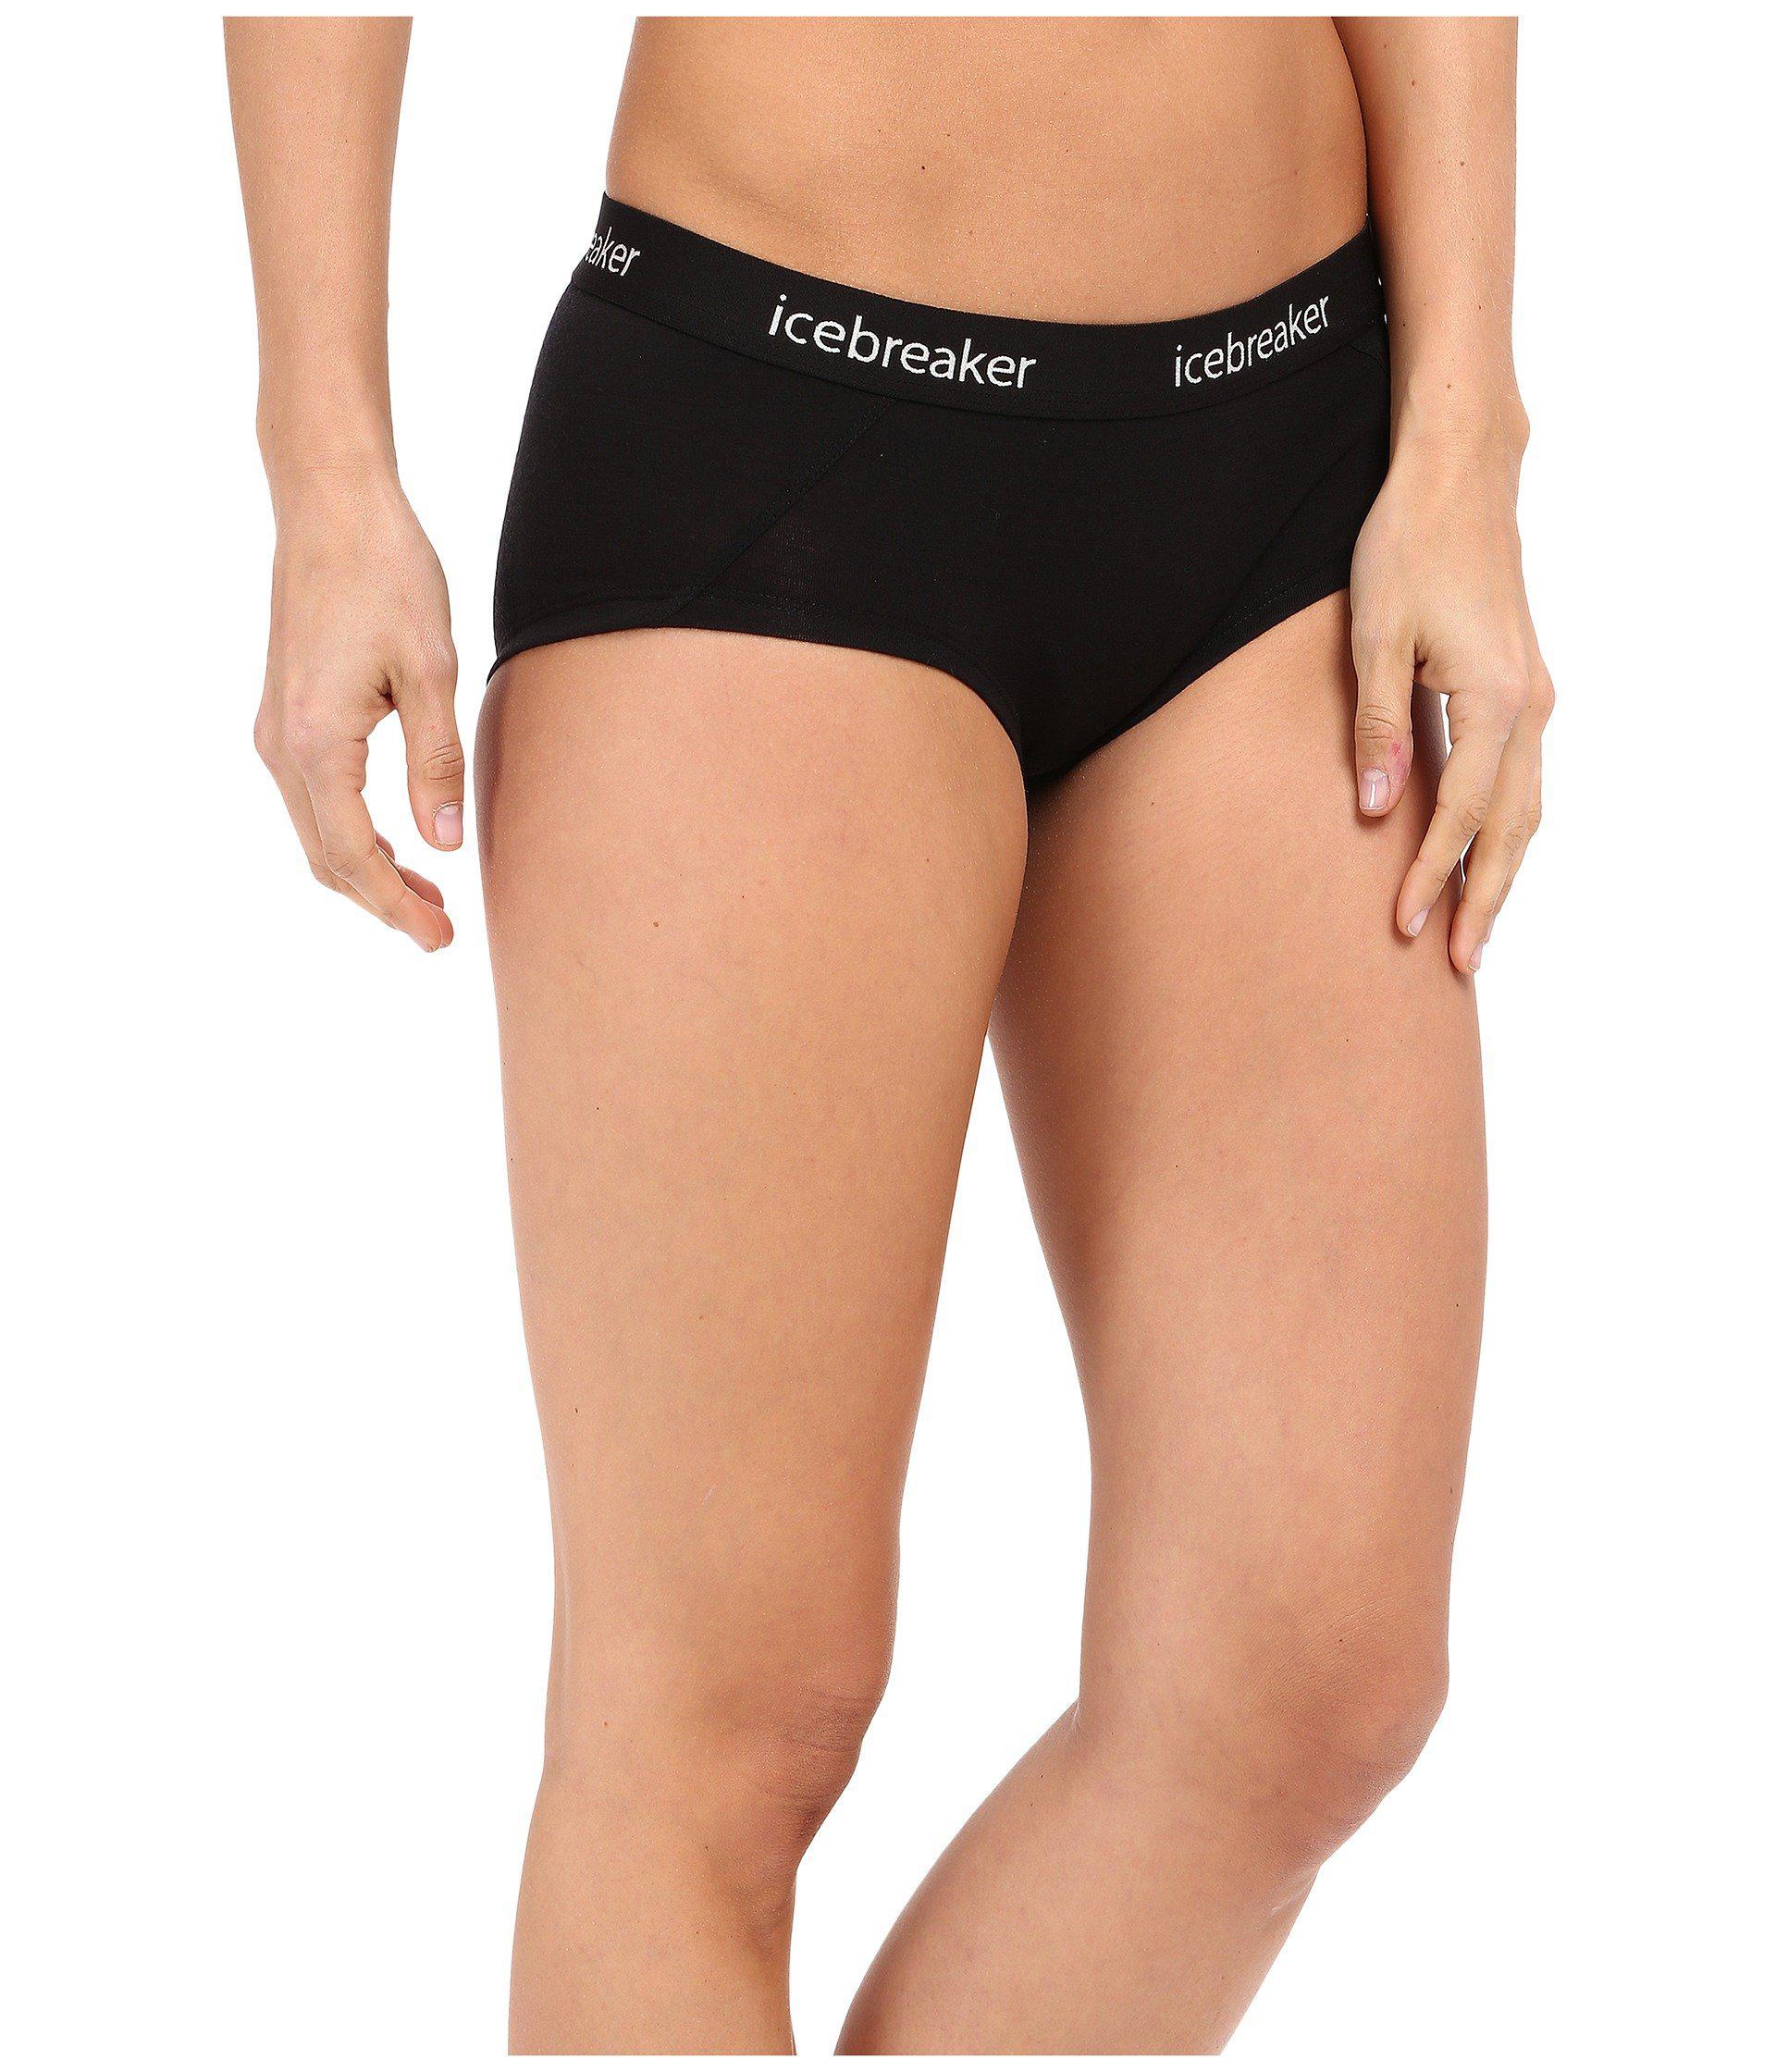 43e8850b423 Icebreaker - Sprite Hot Pant (black black) Women s Underwear - Lyst. View  fullscreen